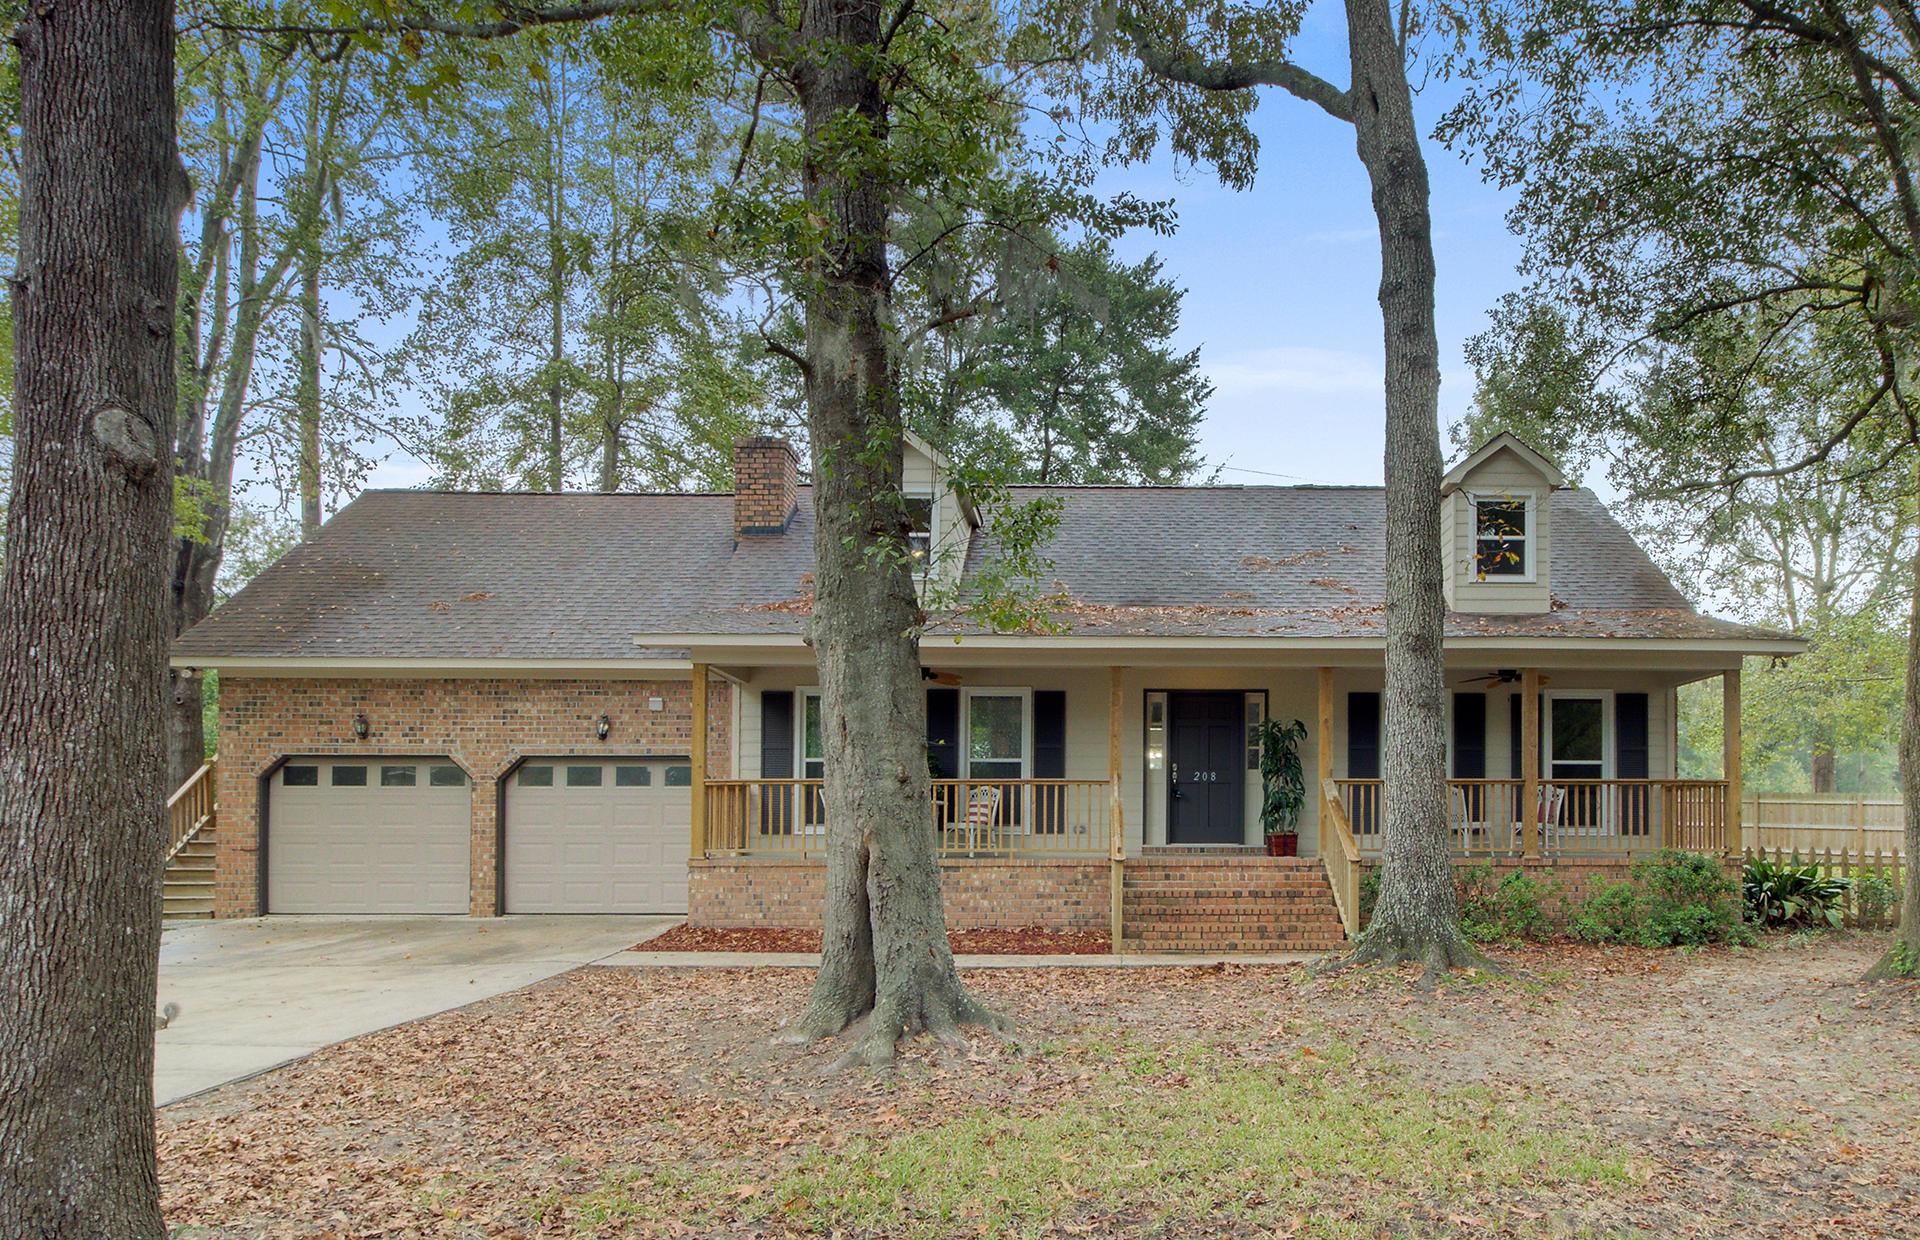 White Church Place Homes For Sale - 208 Glebe, Summerville, SC - 4